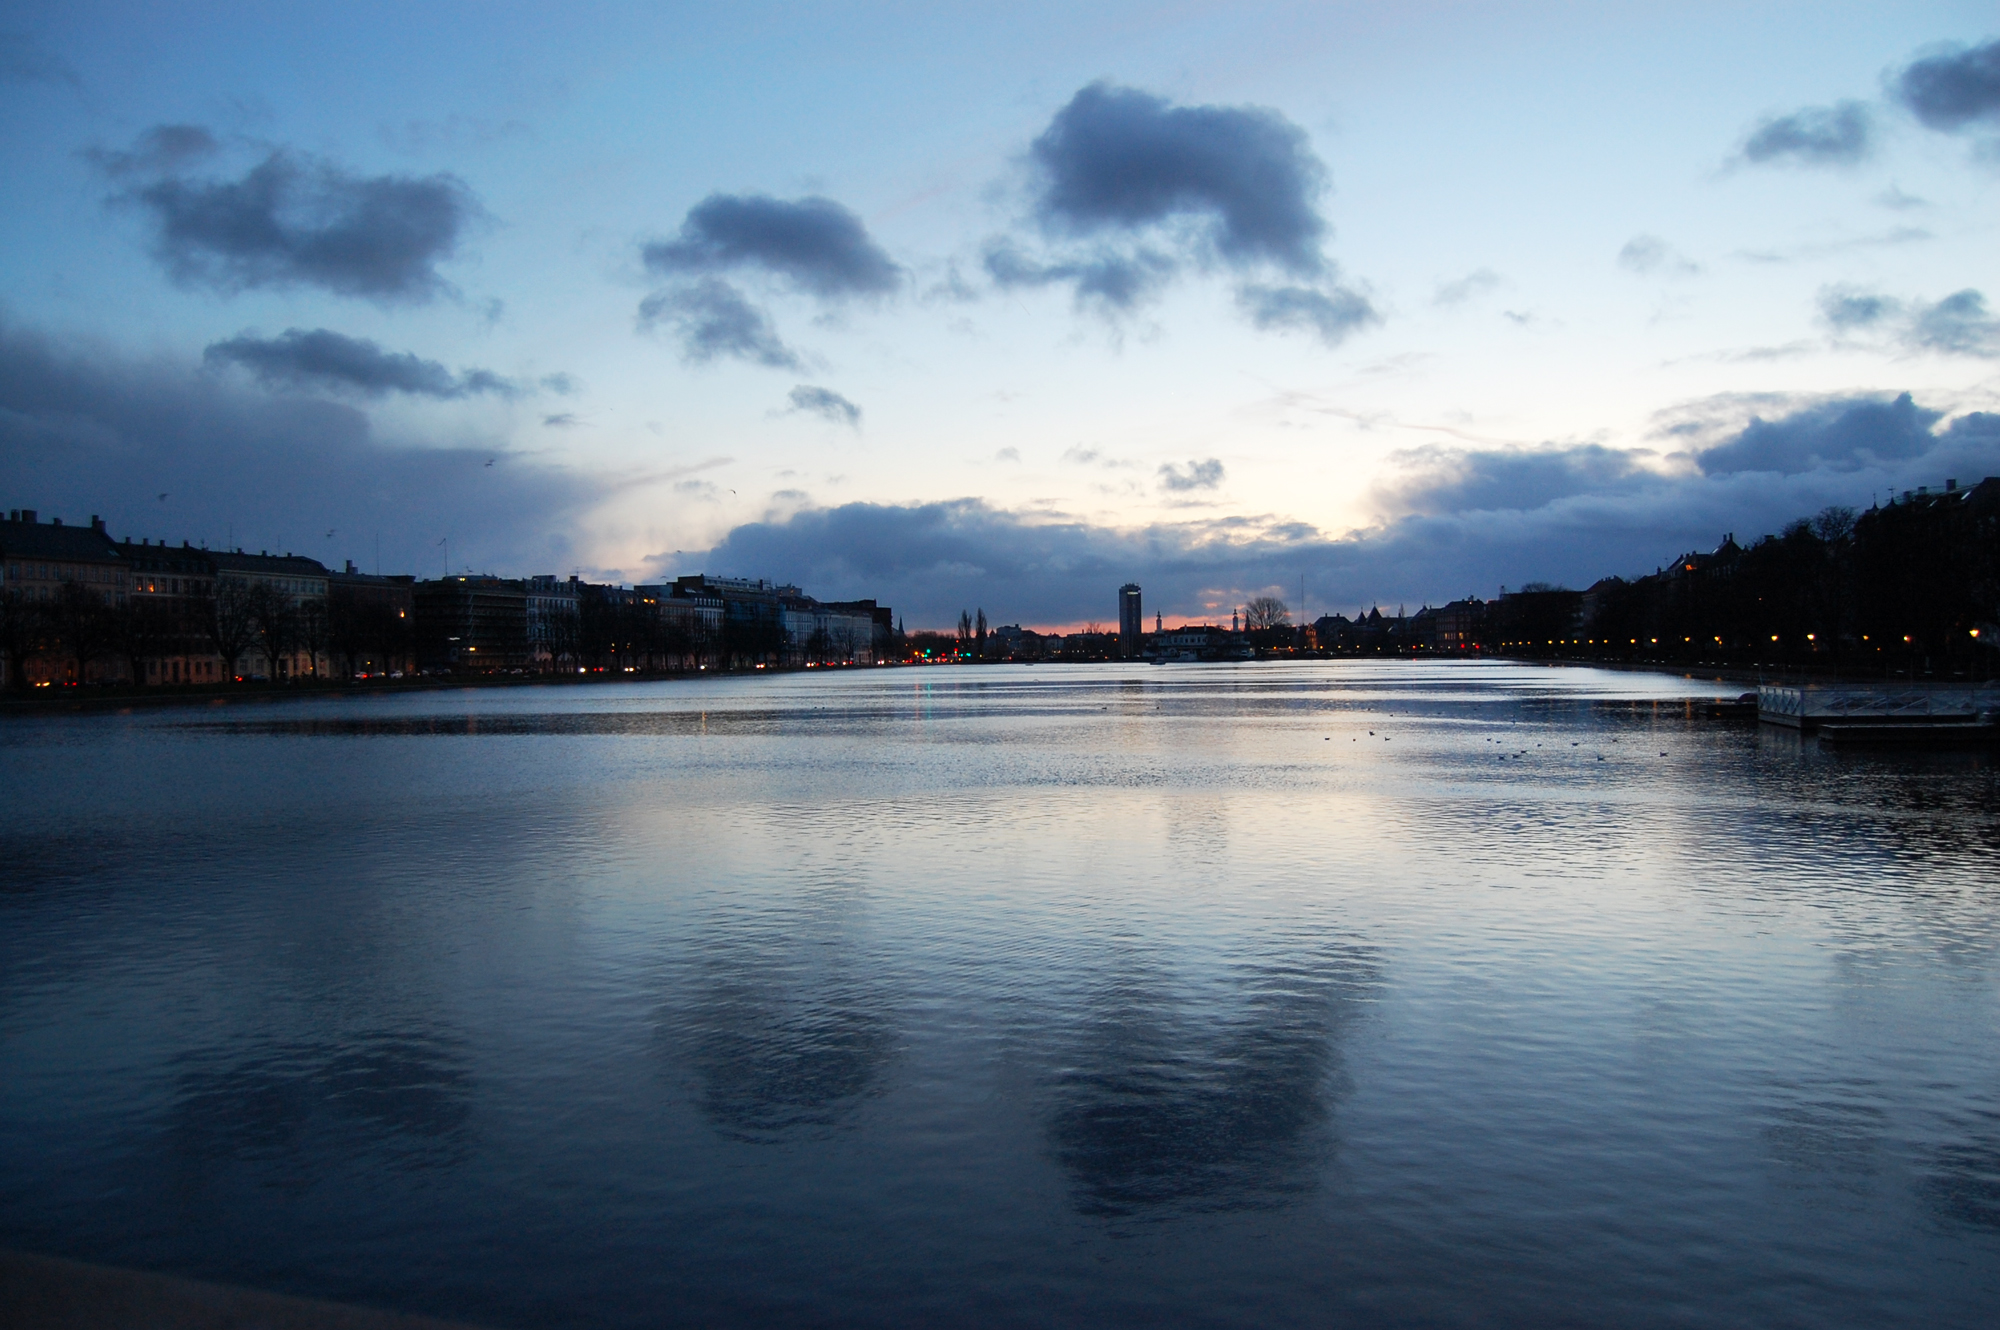 Sunset on the bridge to Nørrebro